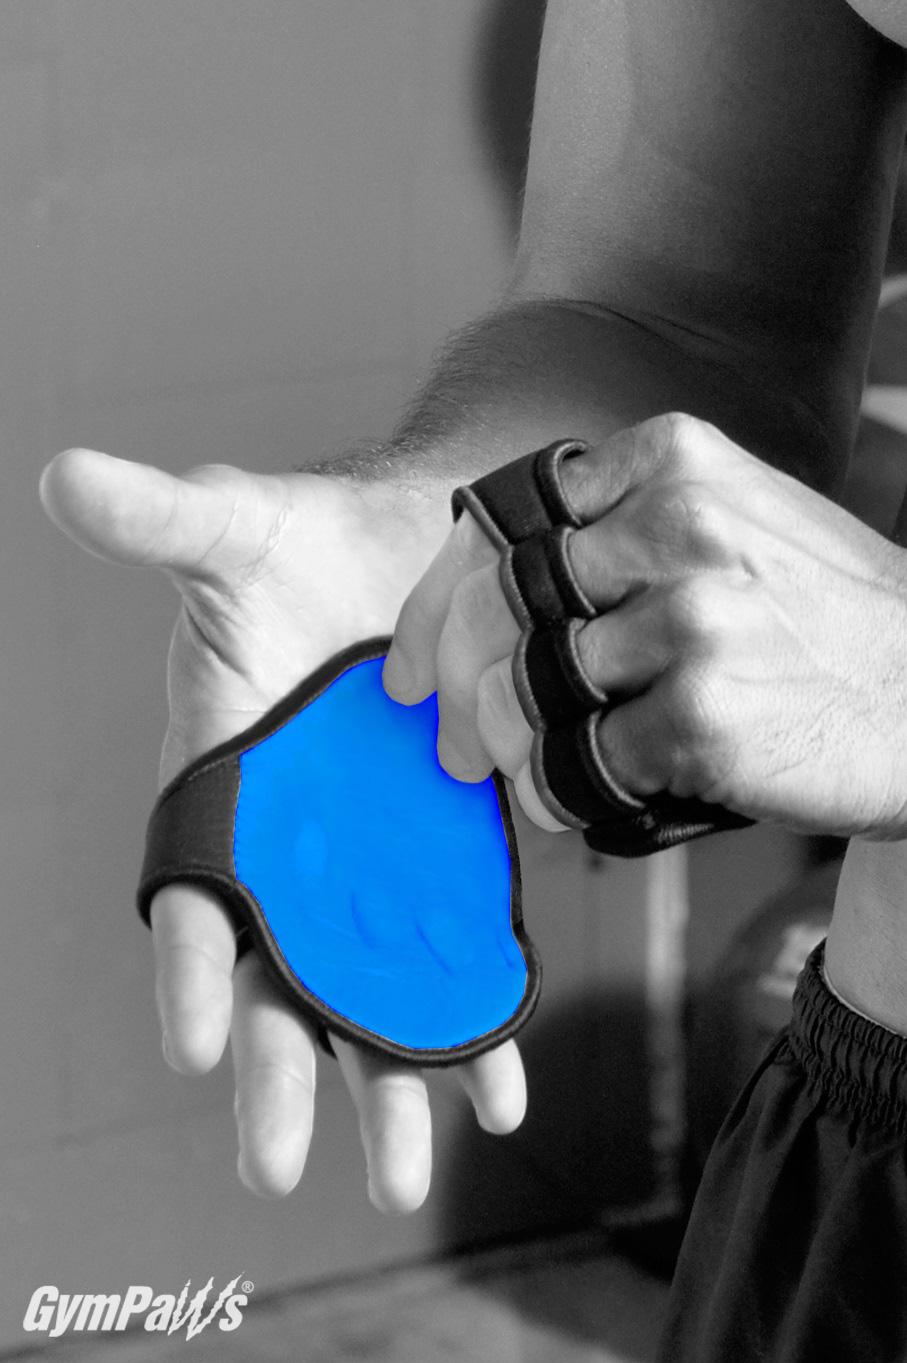 Blue Gym Gloves